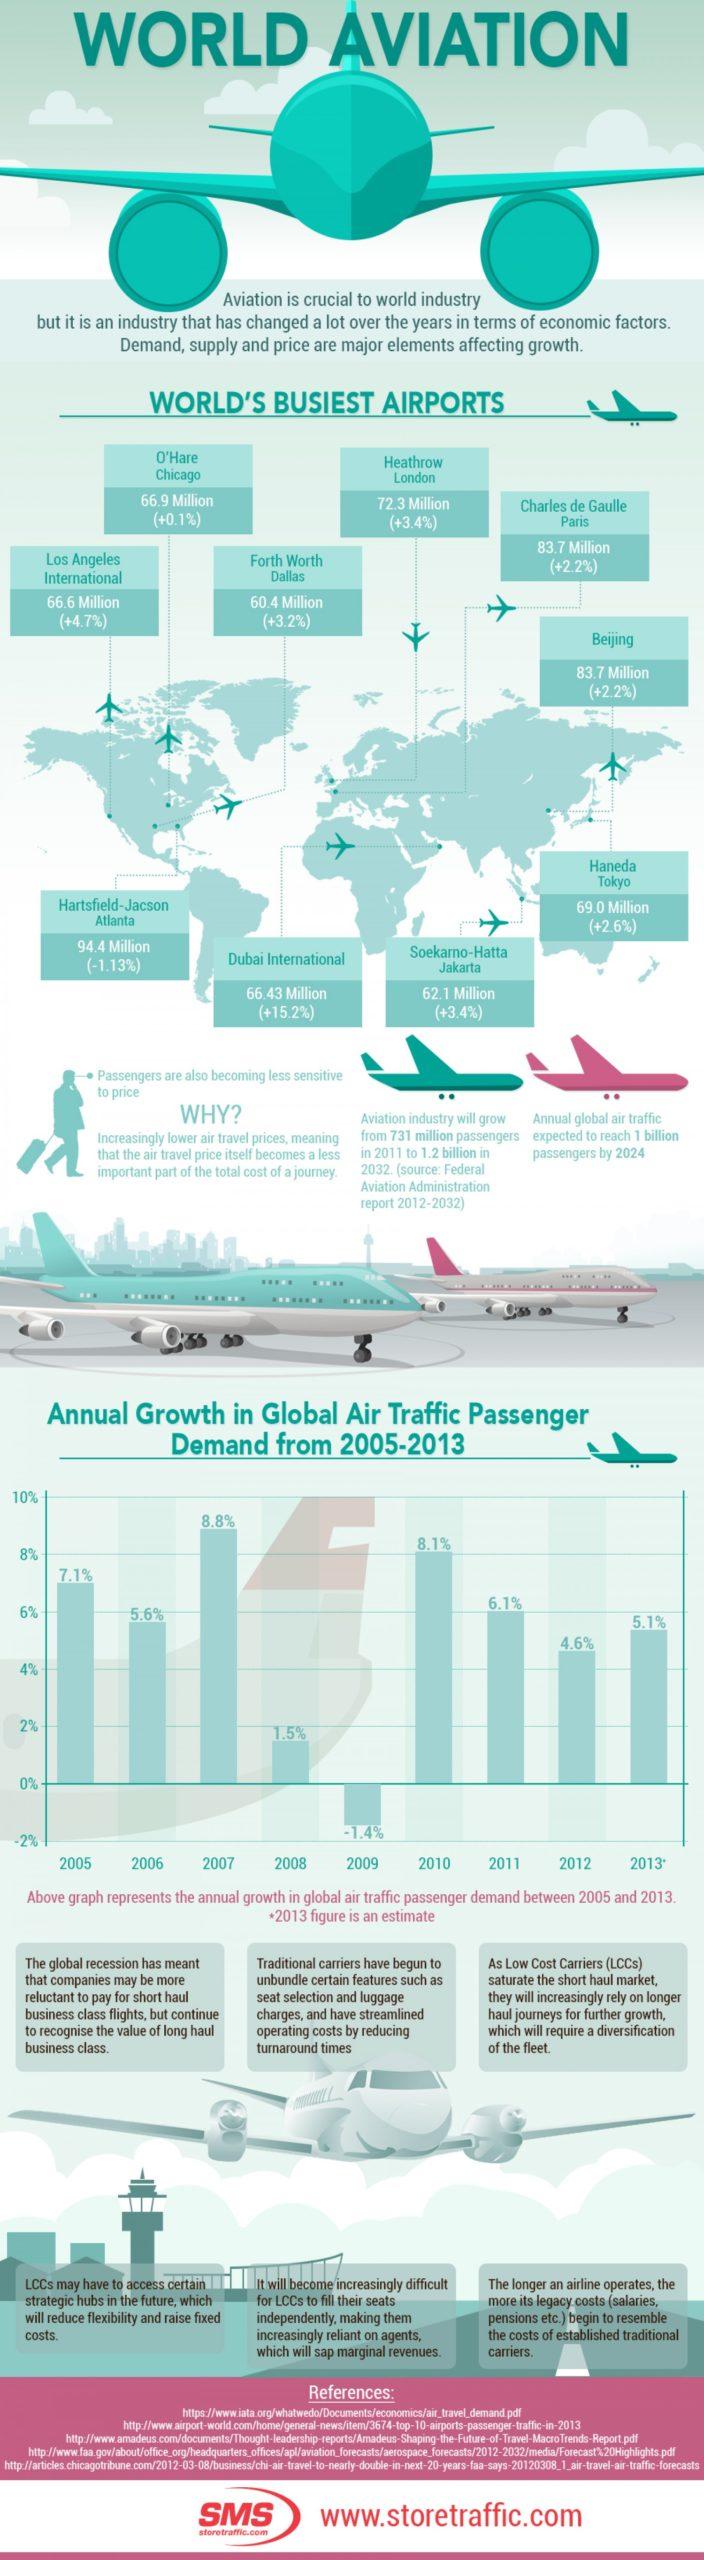 World aviation passenger traffic infographic